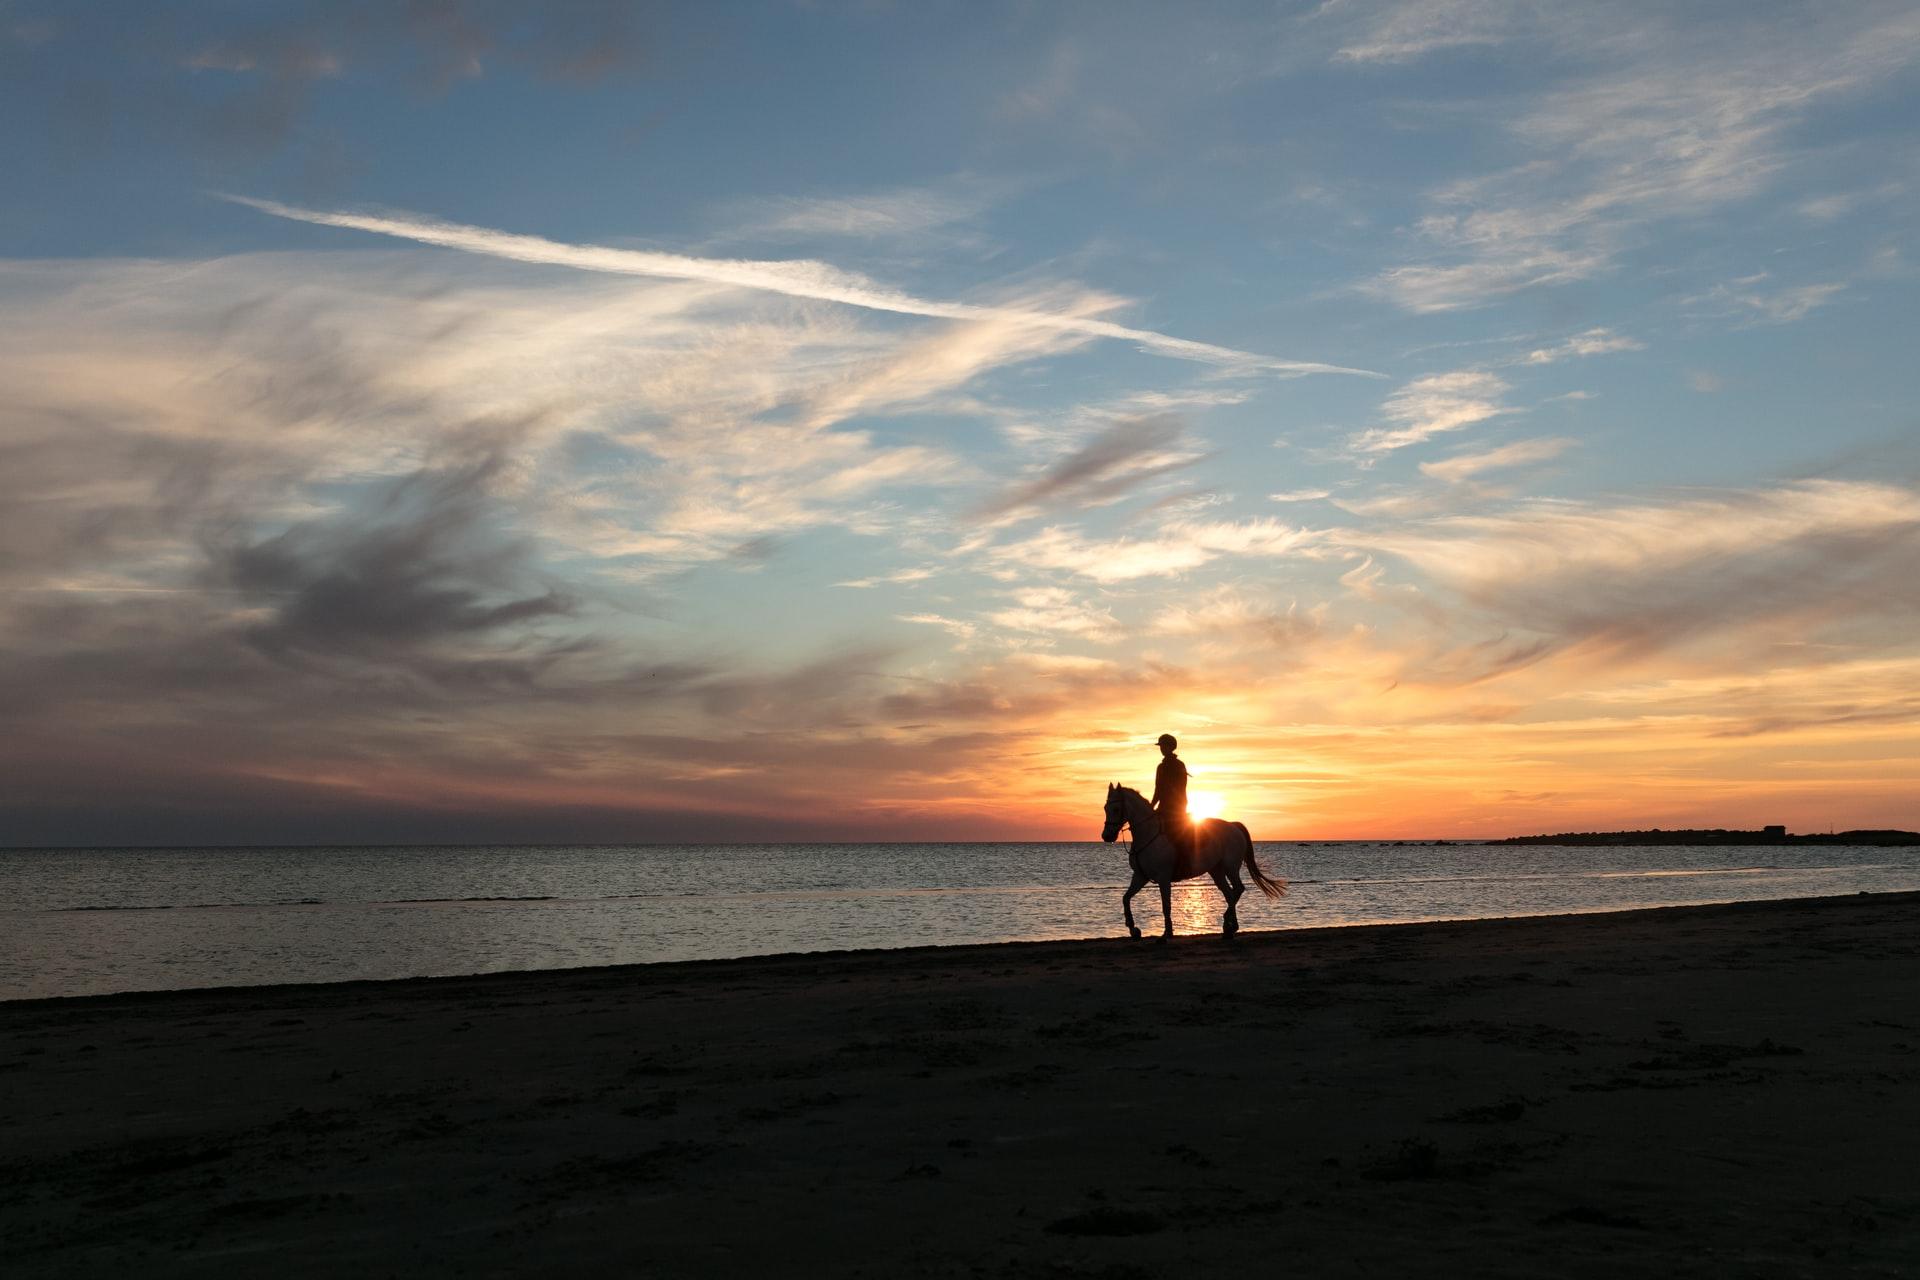 horseride-on-beach